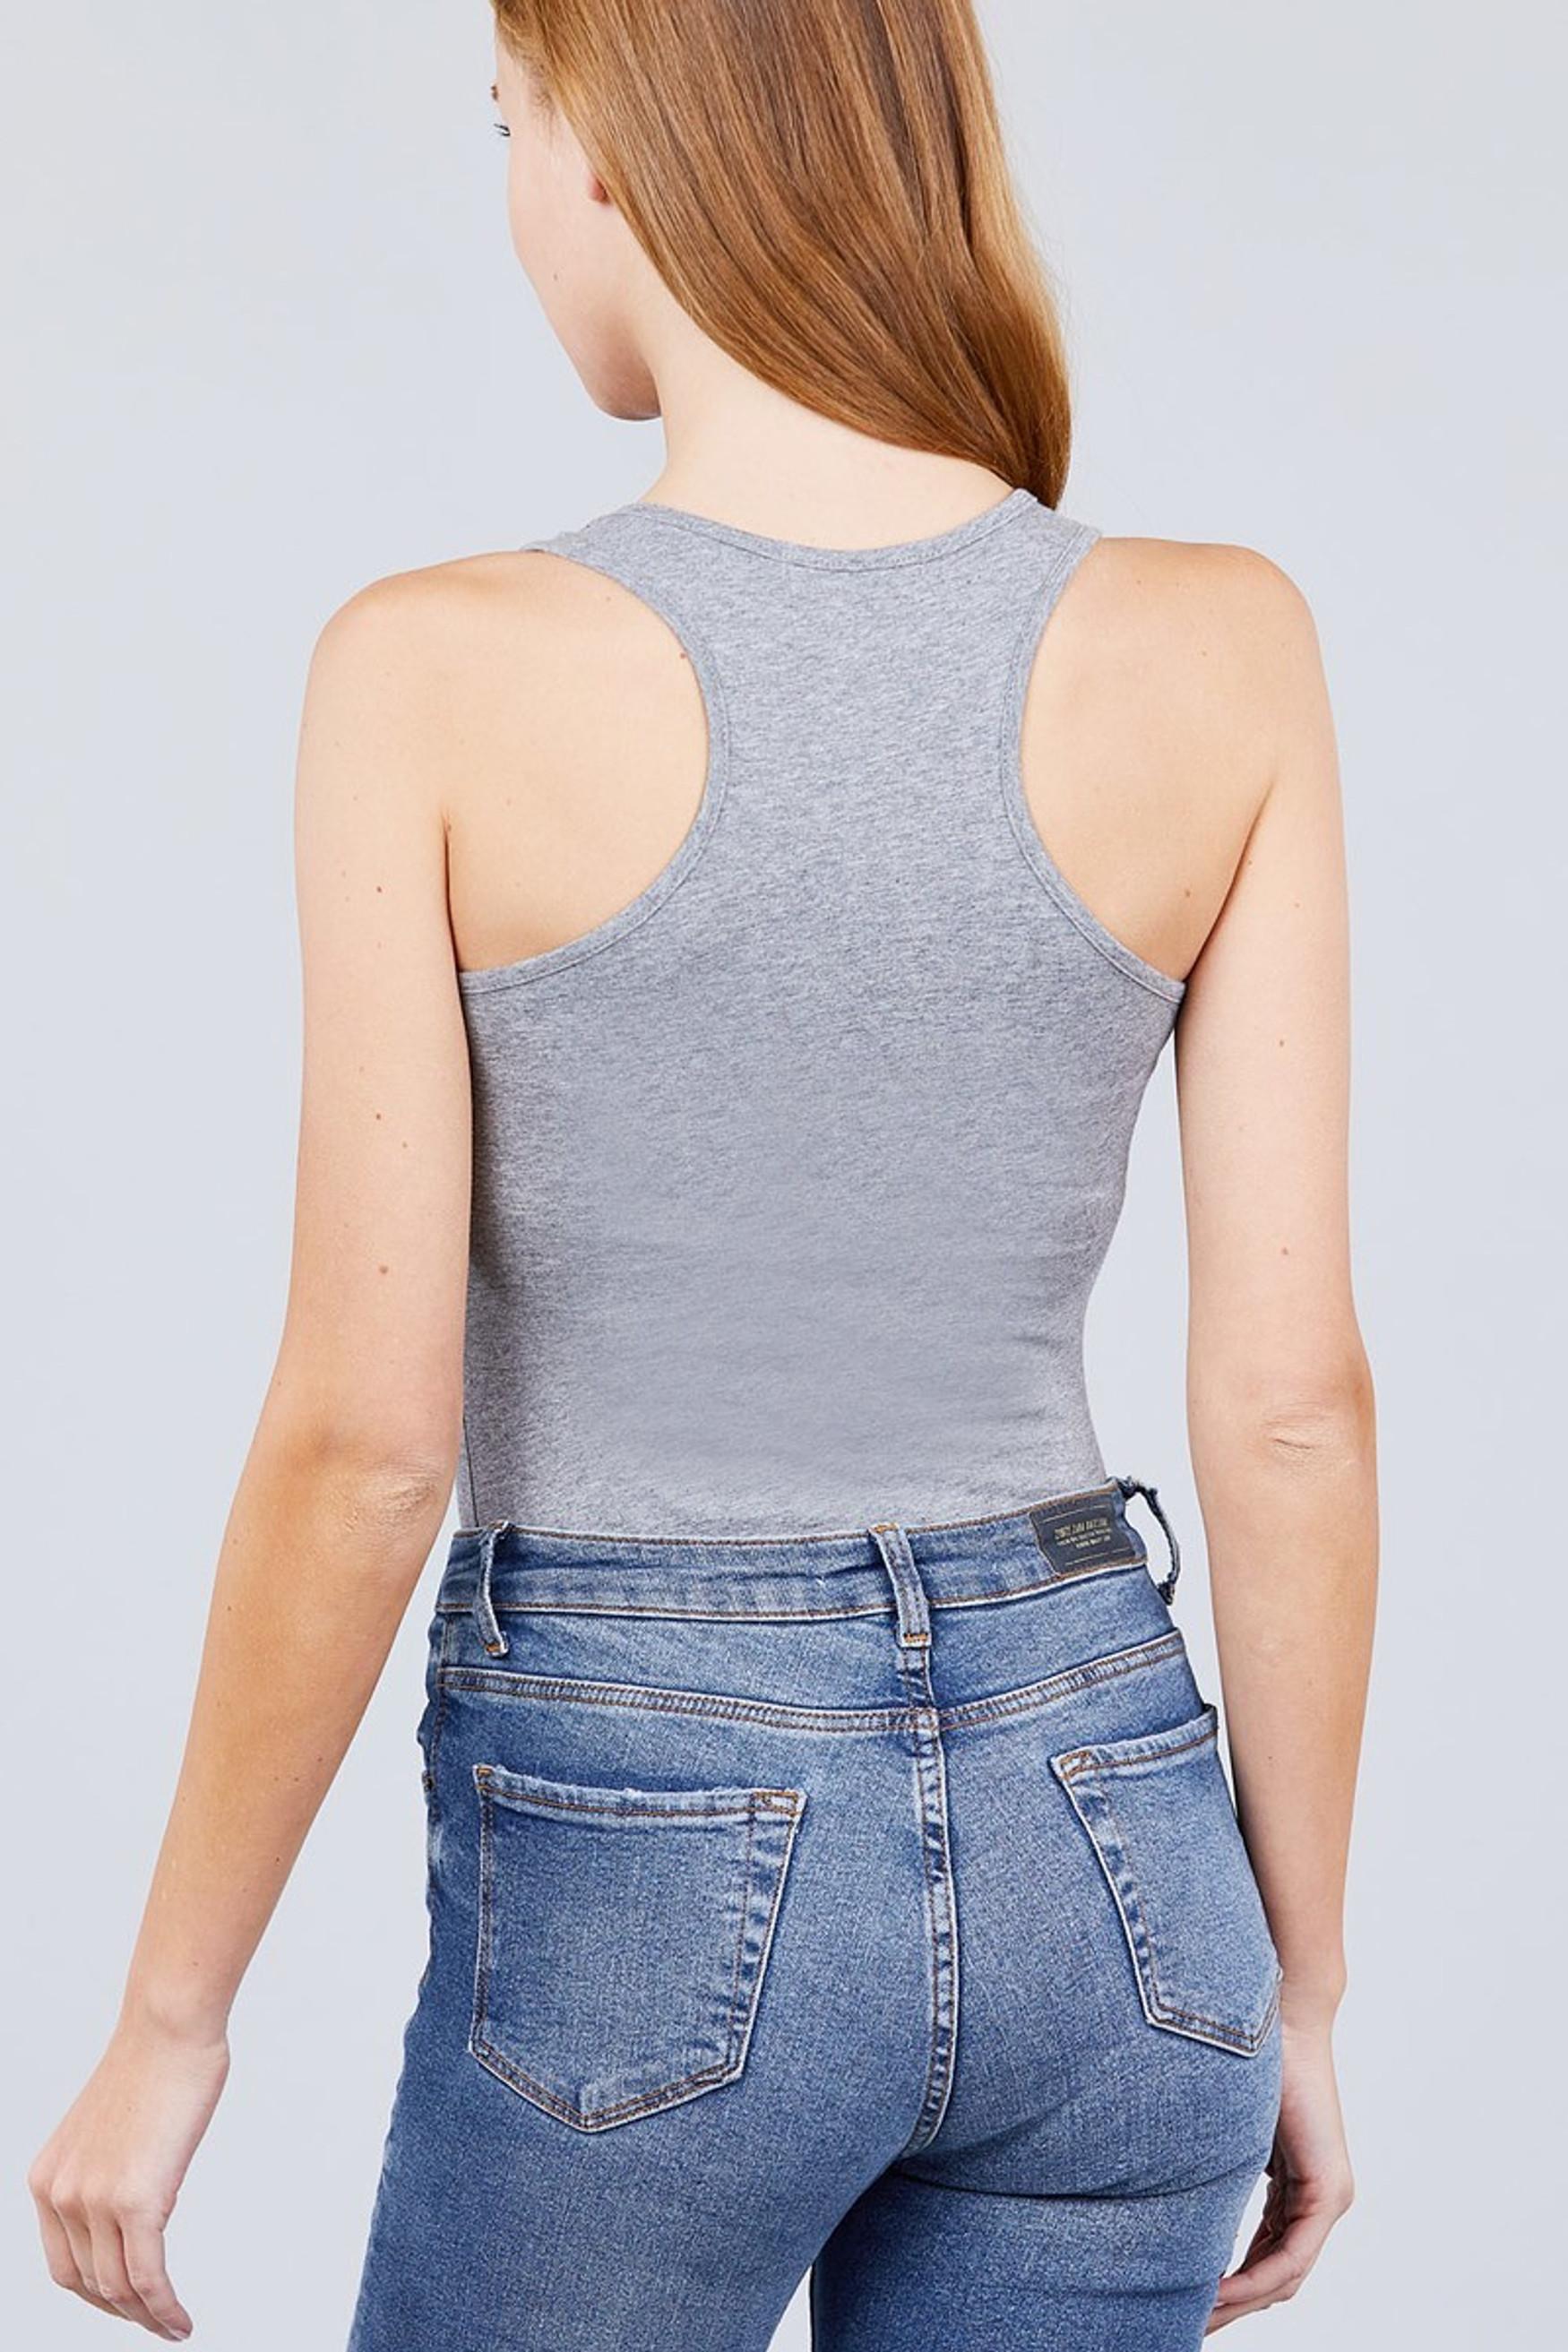 Heather Gray Basic Solid Scoop Neck Cotton Bodysuit